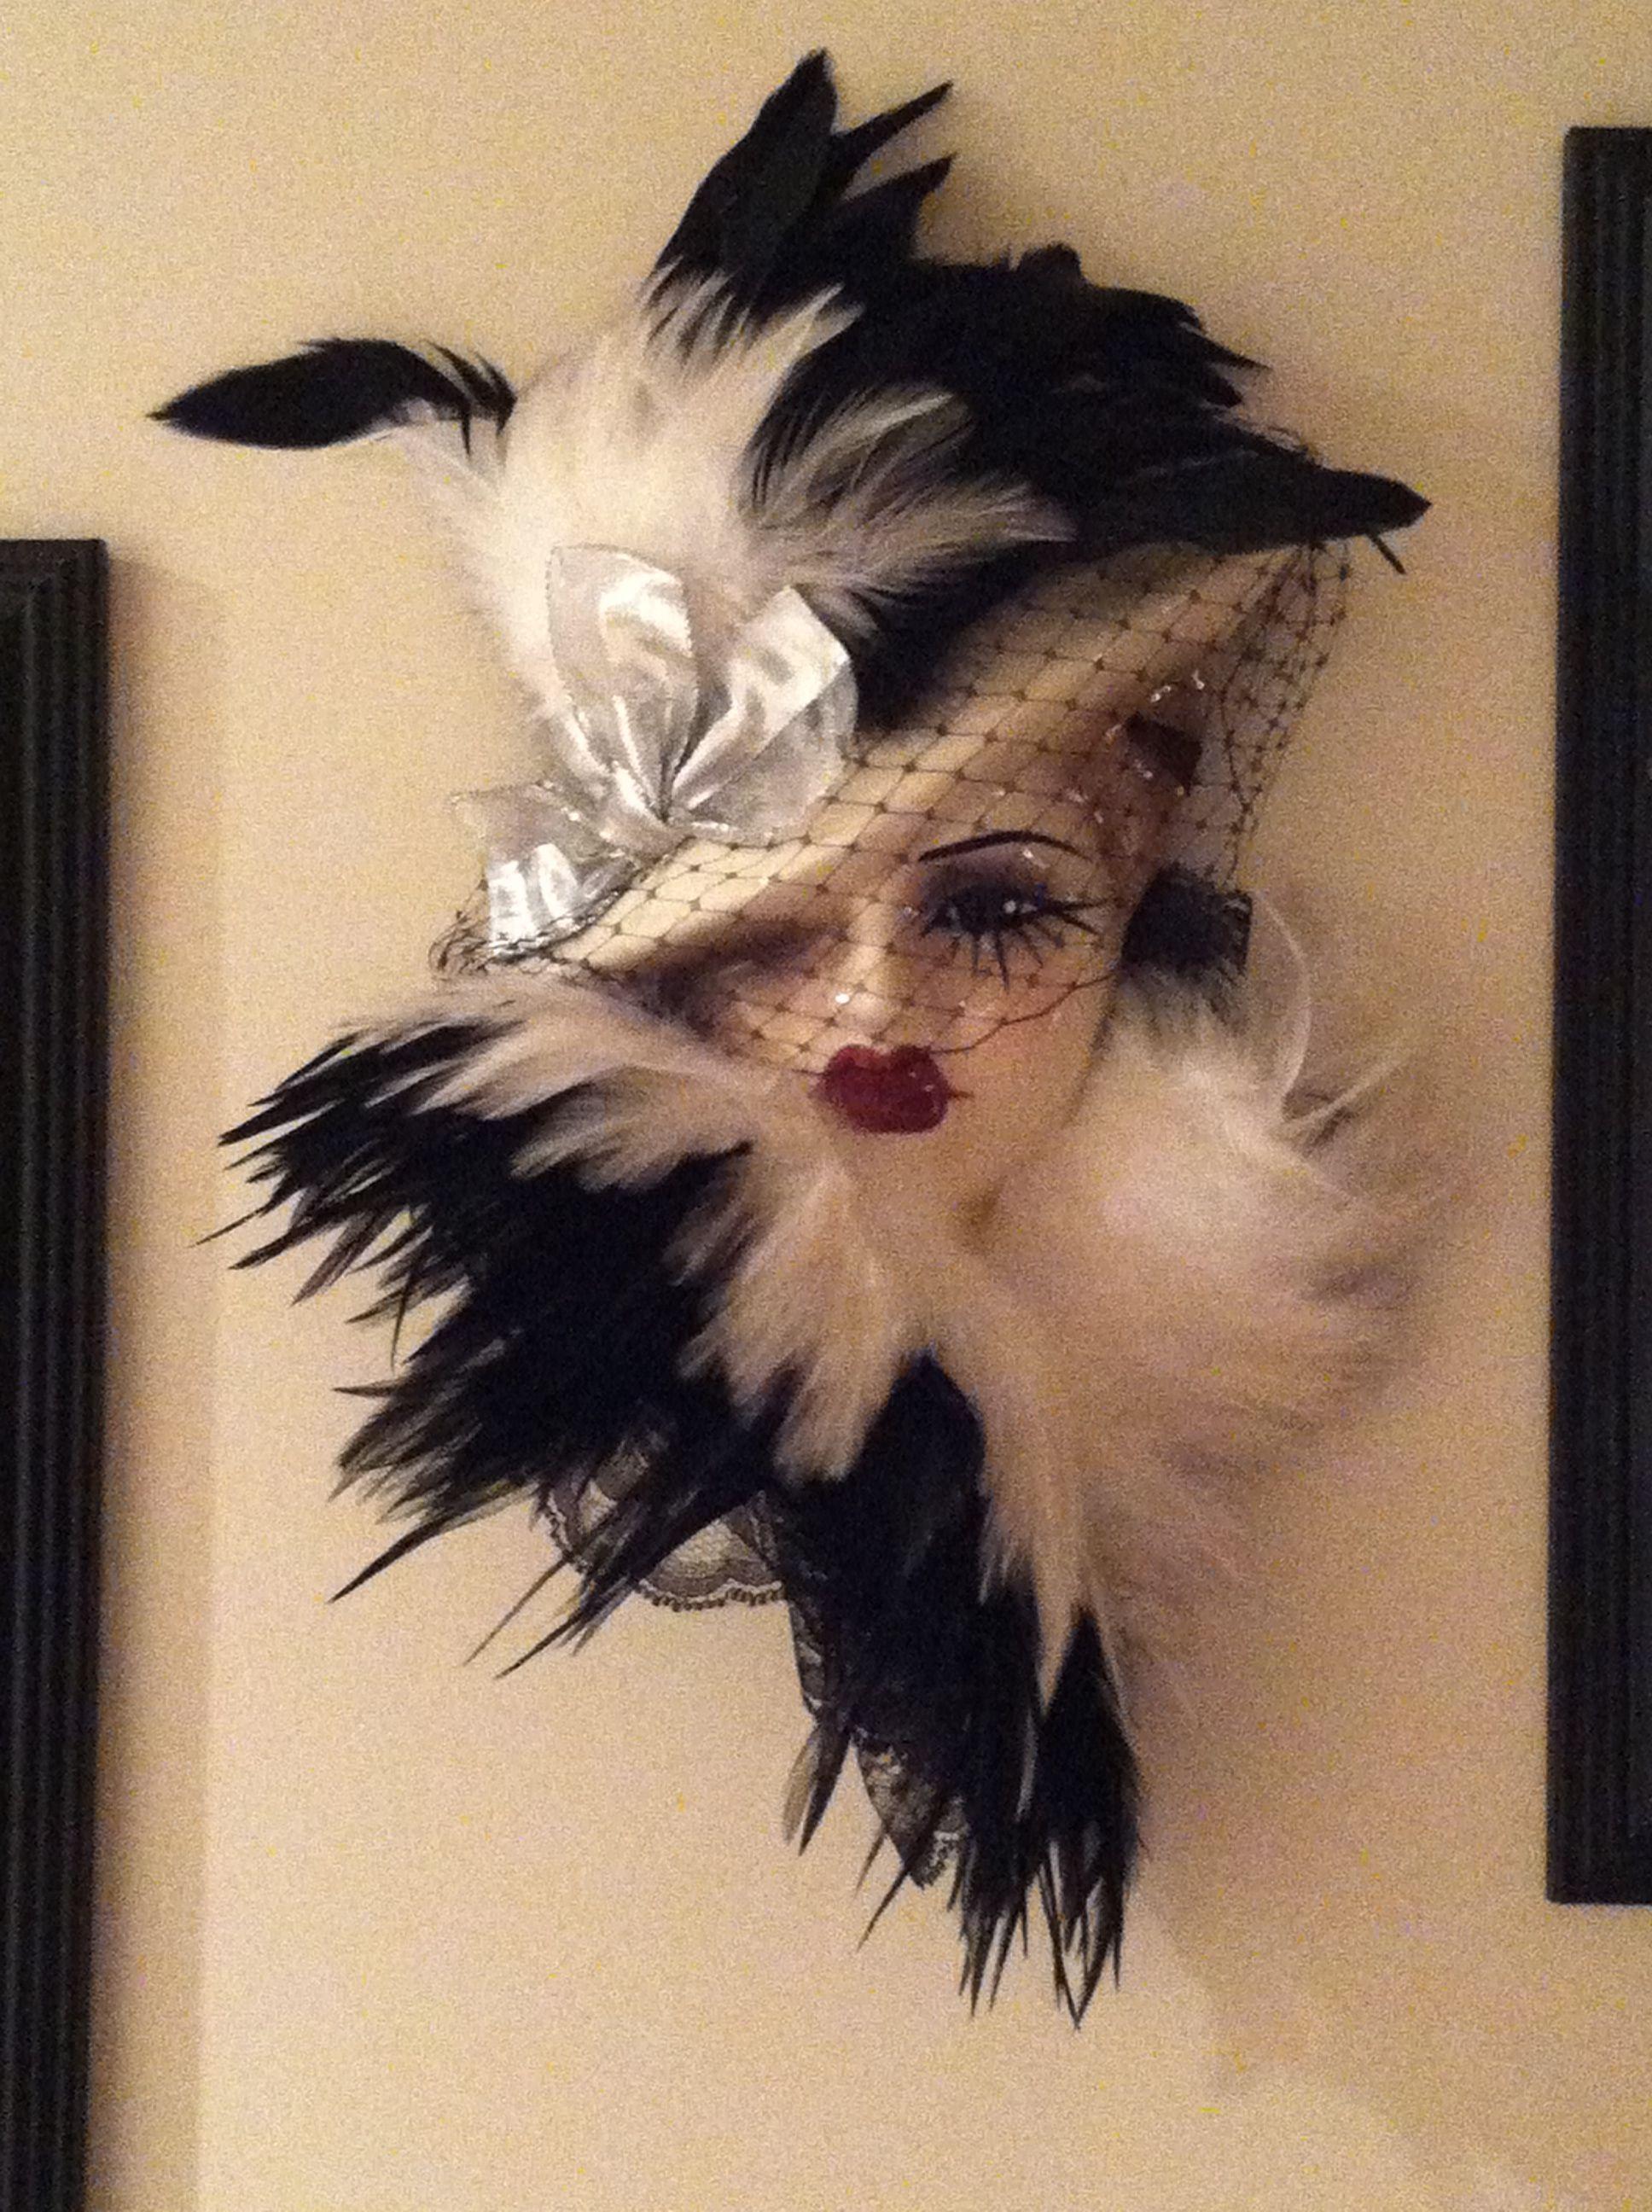 Mask Decoration Ideas Impressive Porcelain Feathered Mask Love This Decoration Idea  Porcelain Design Inspiration